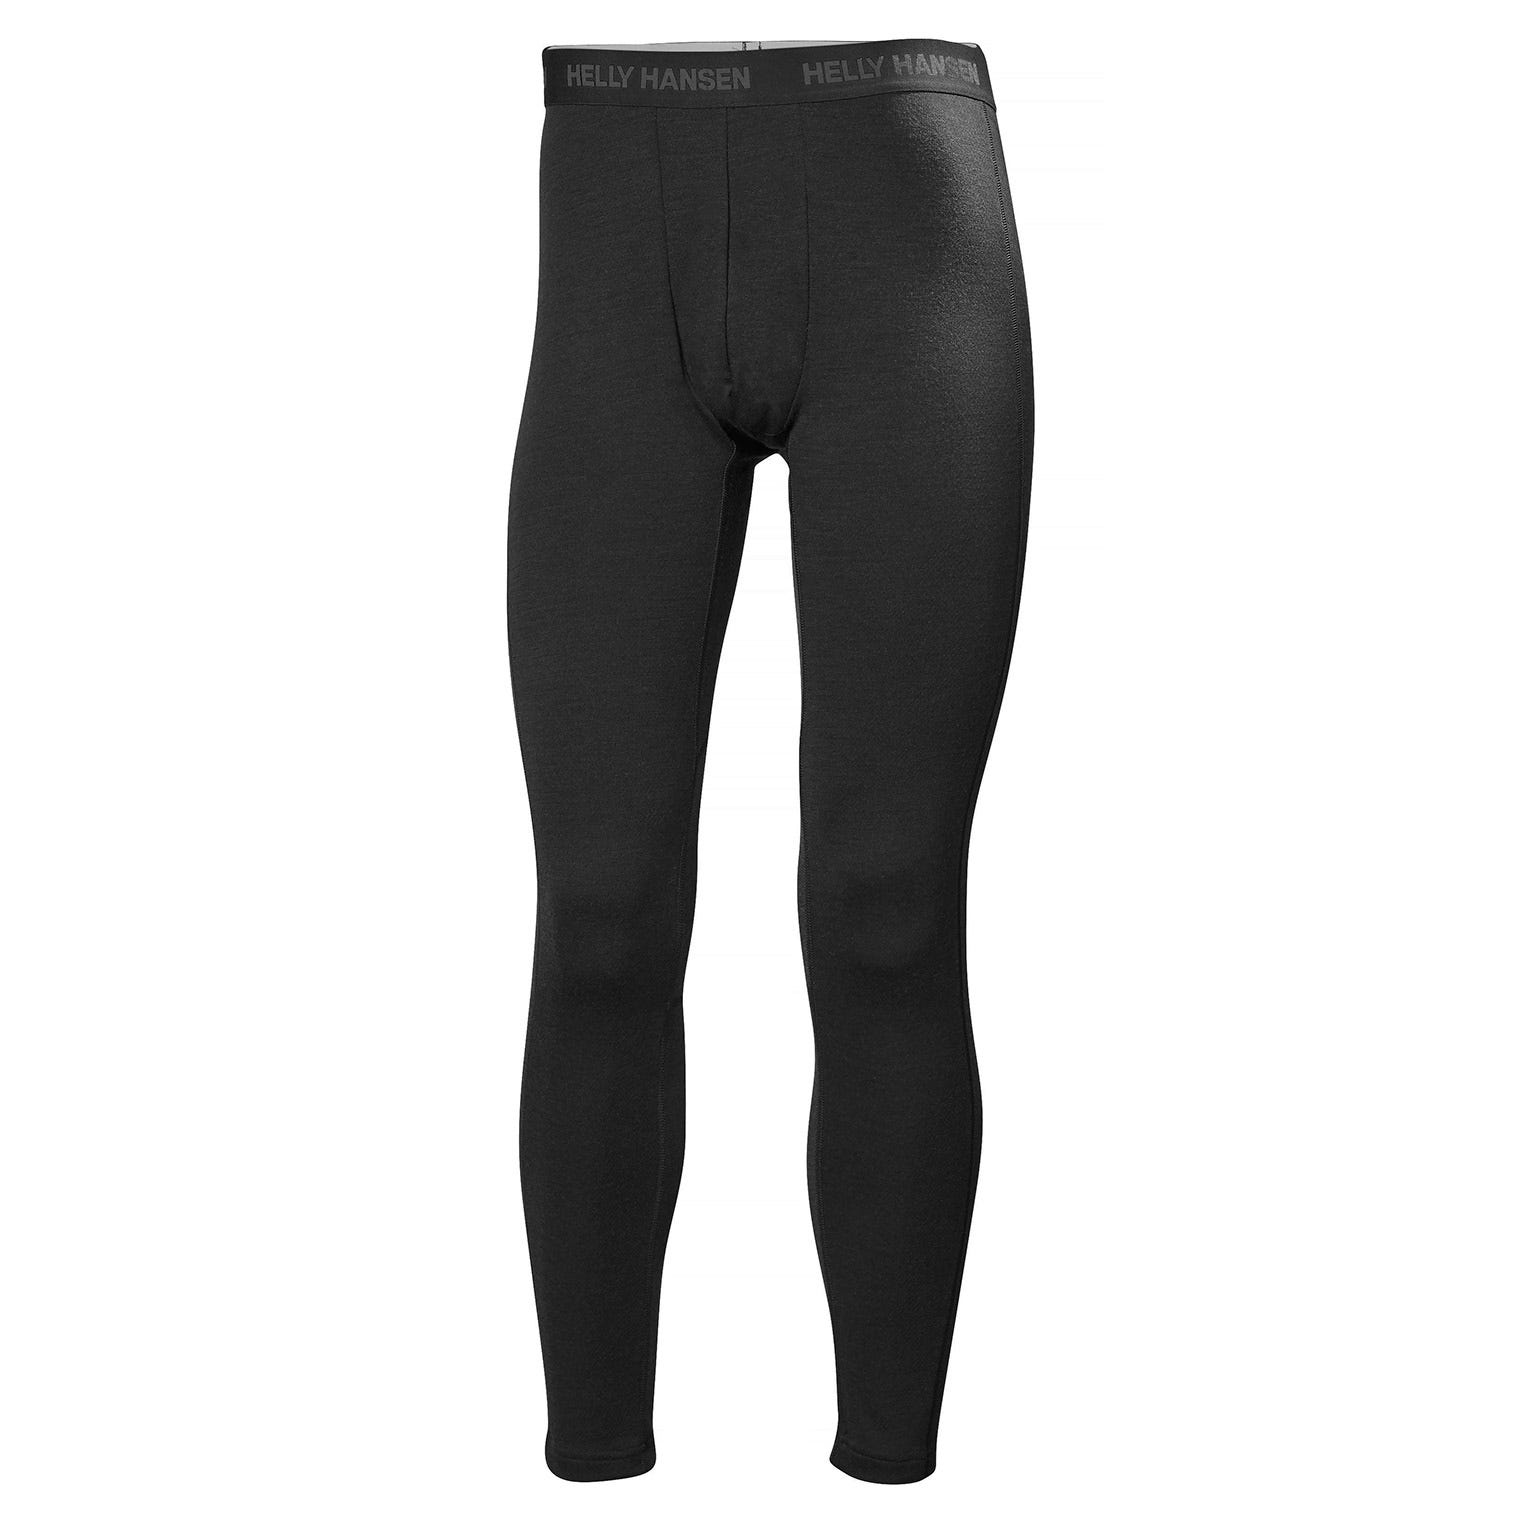 Helly Hansen Workwear Mens Hh LIFA Merino Pant